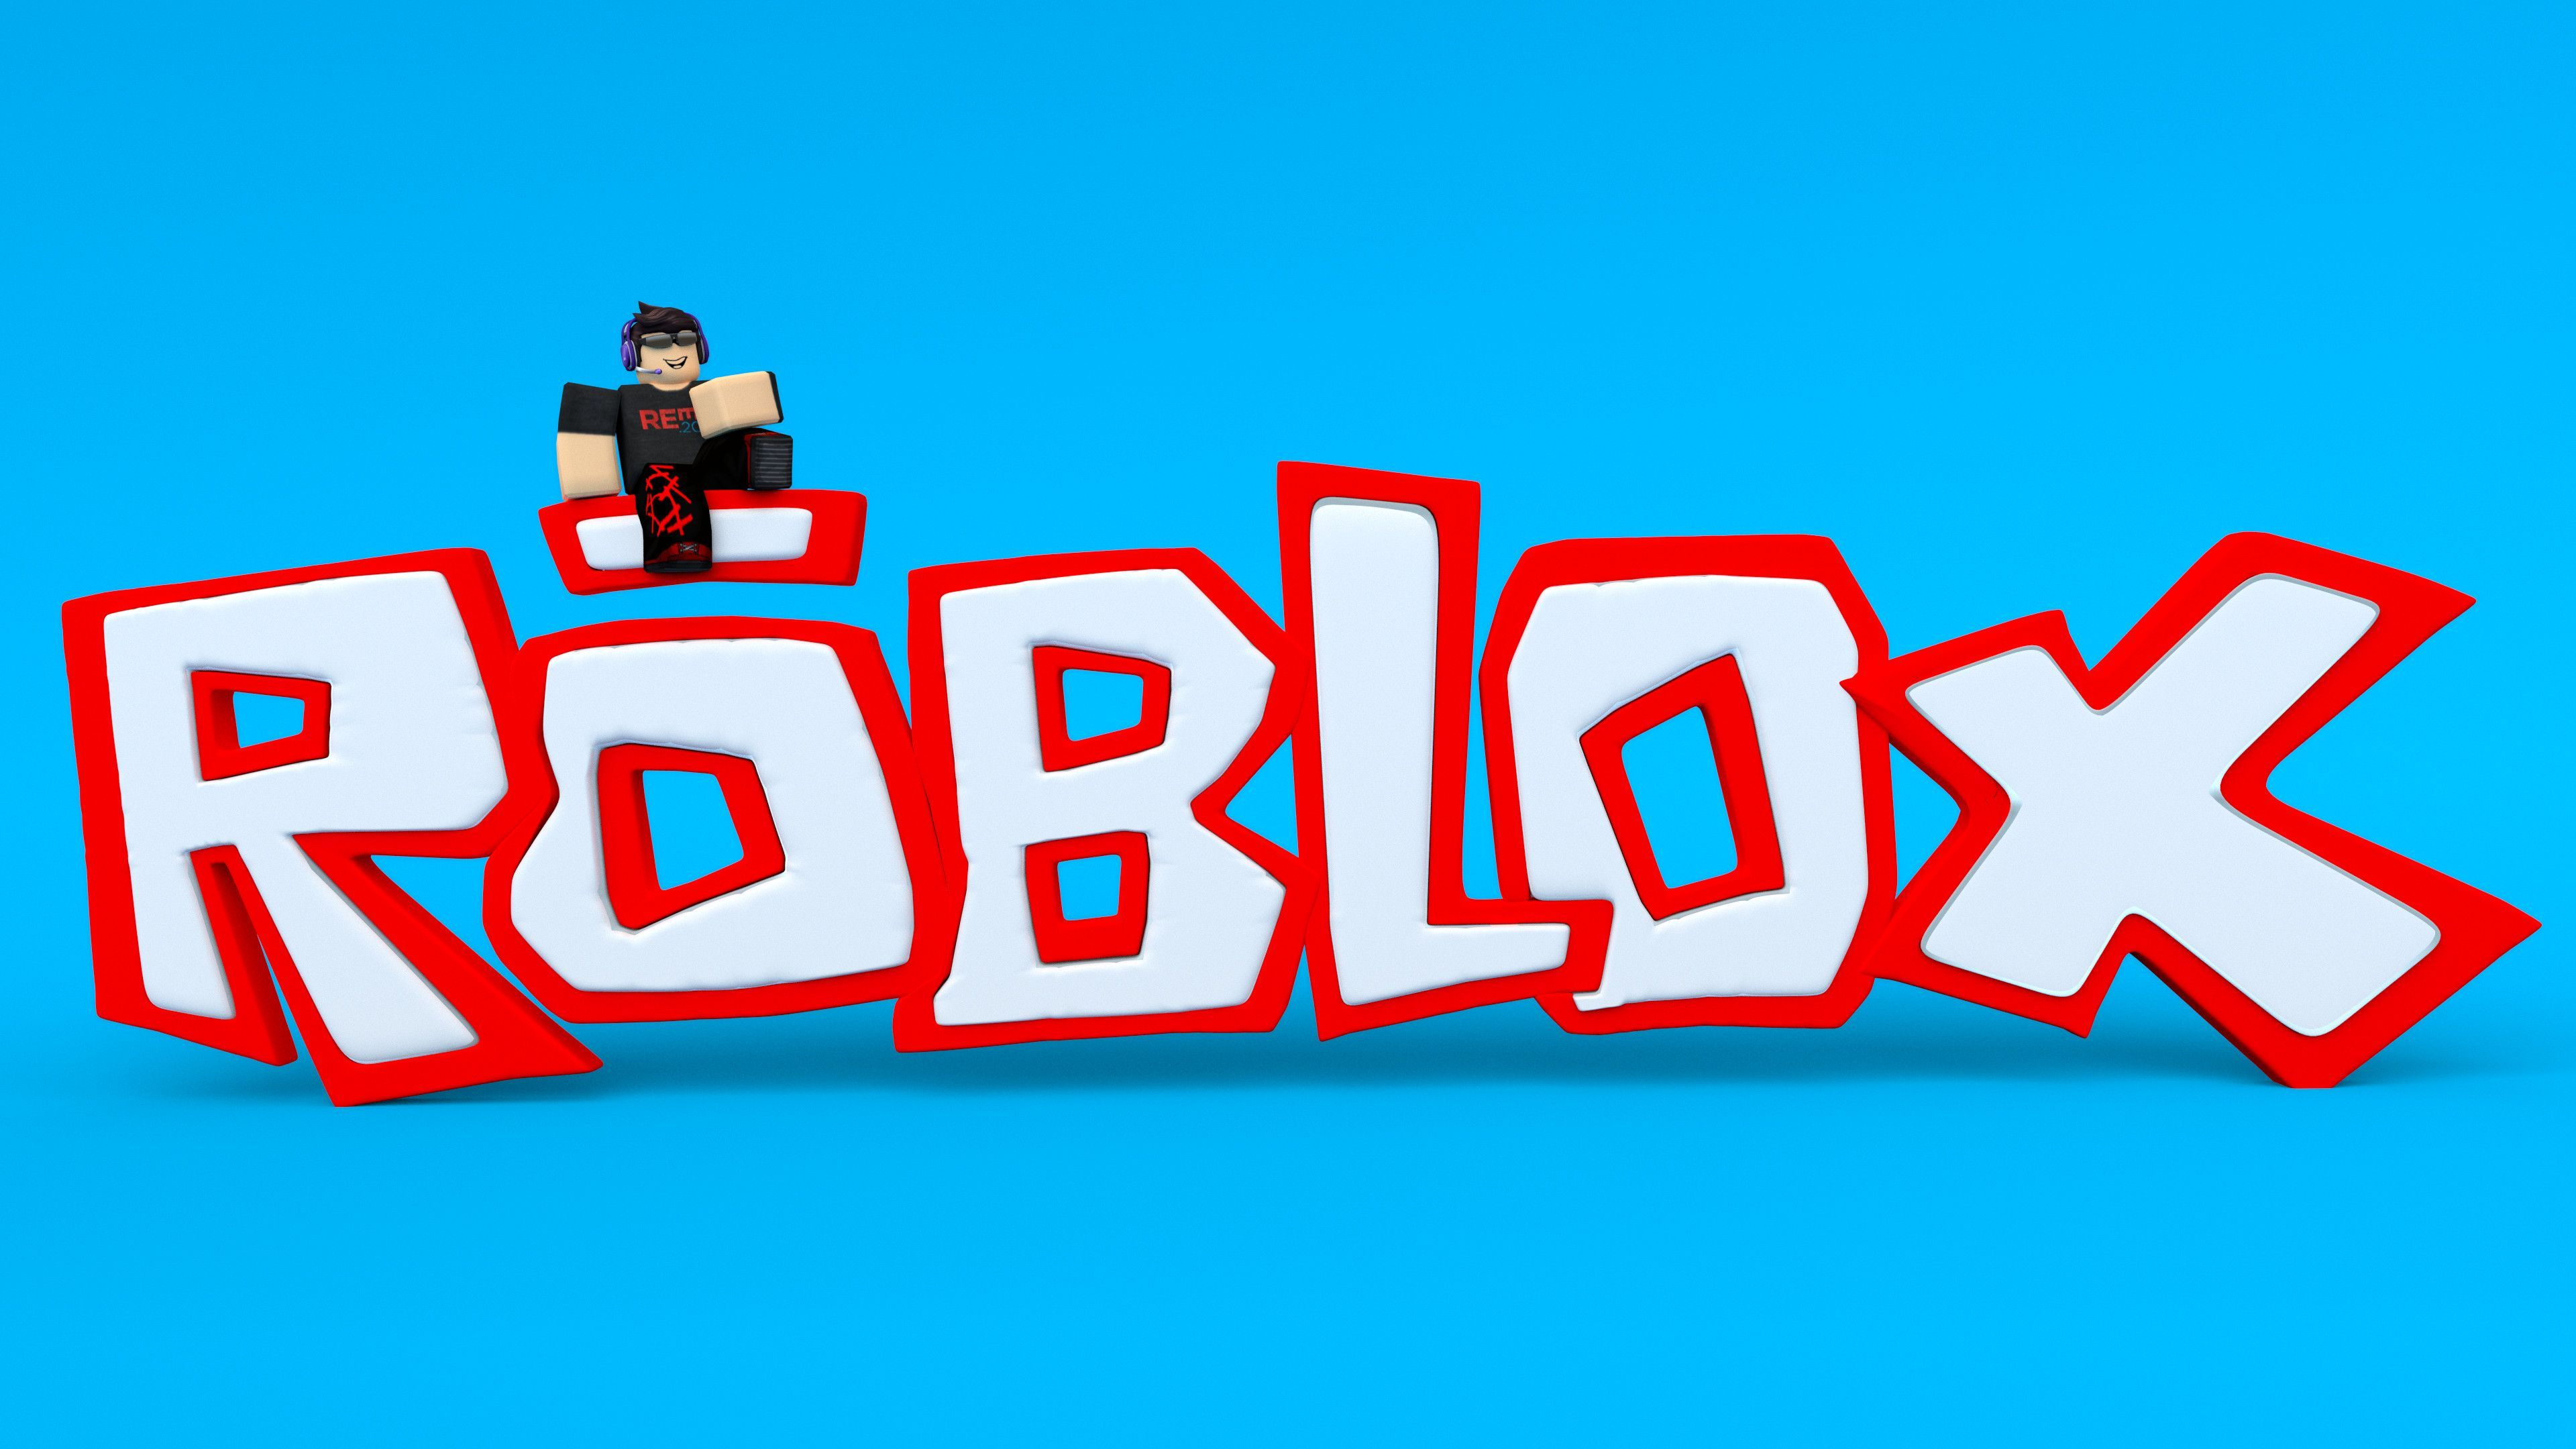 Banner 2048x1152 Roblox Png Google Penelusuran Em 2020 Garotas Gamer Coisas Gratis Dinossauro Png